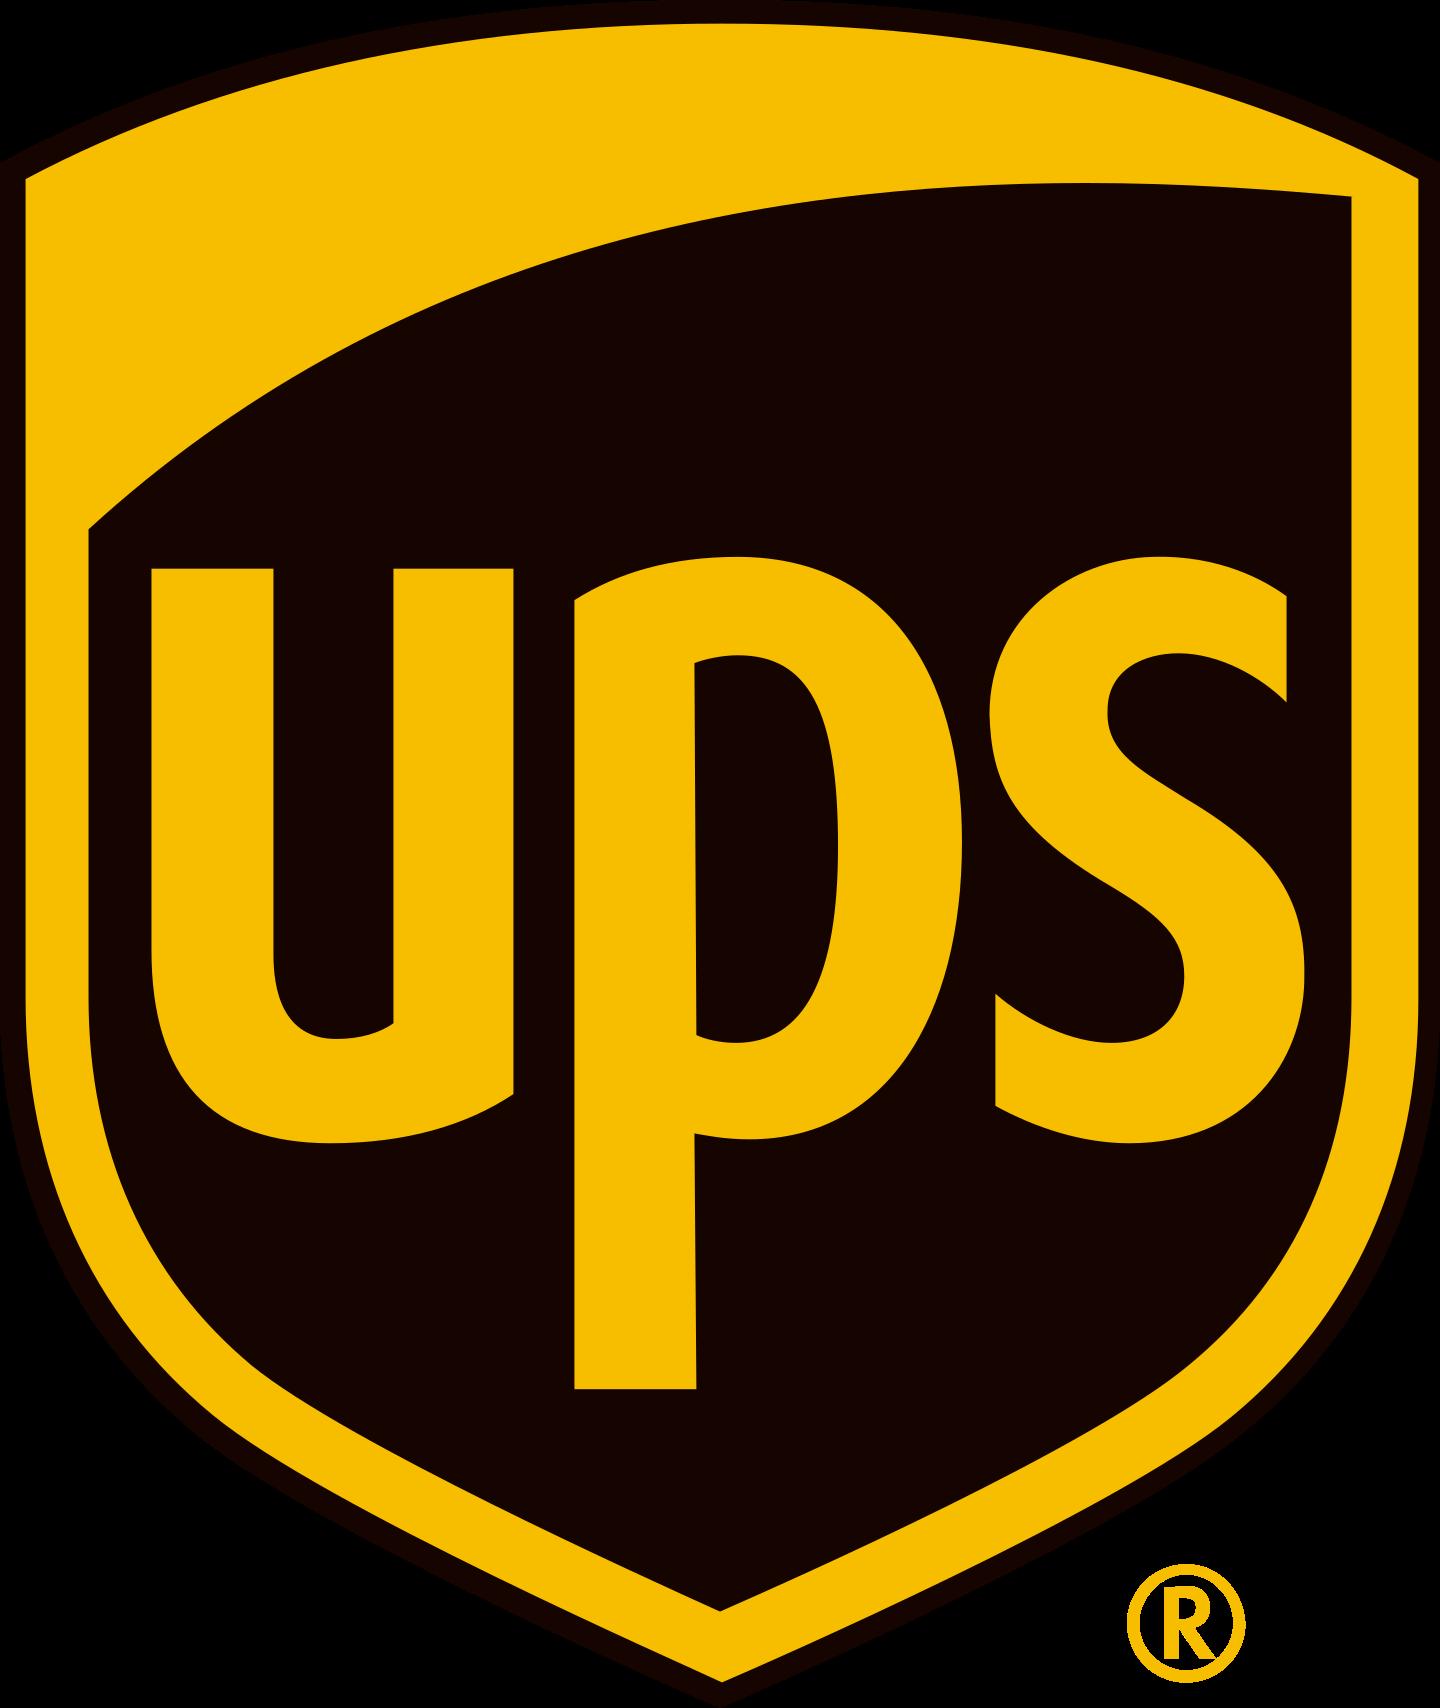 ups logo 2 1 - UPS Logo